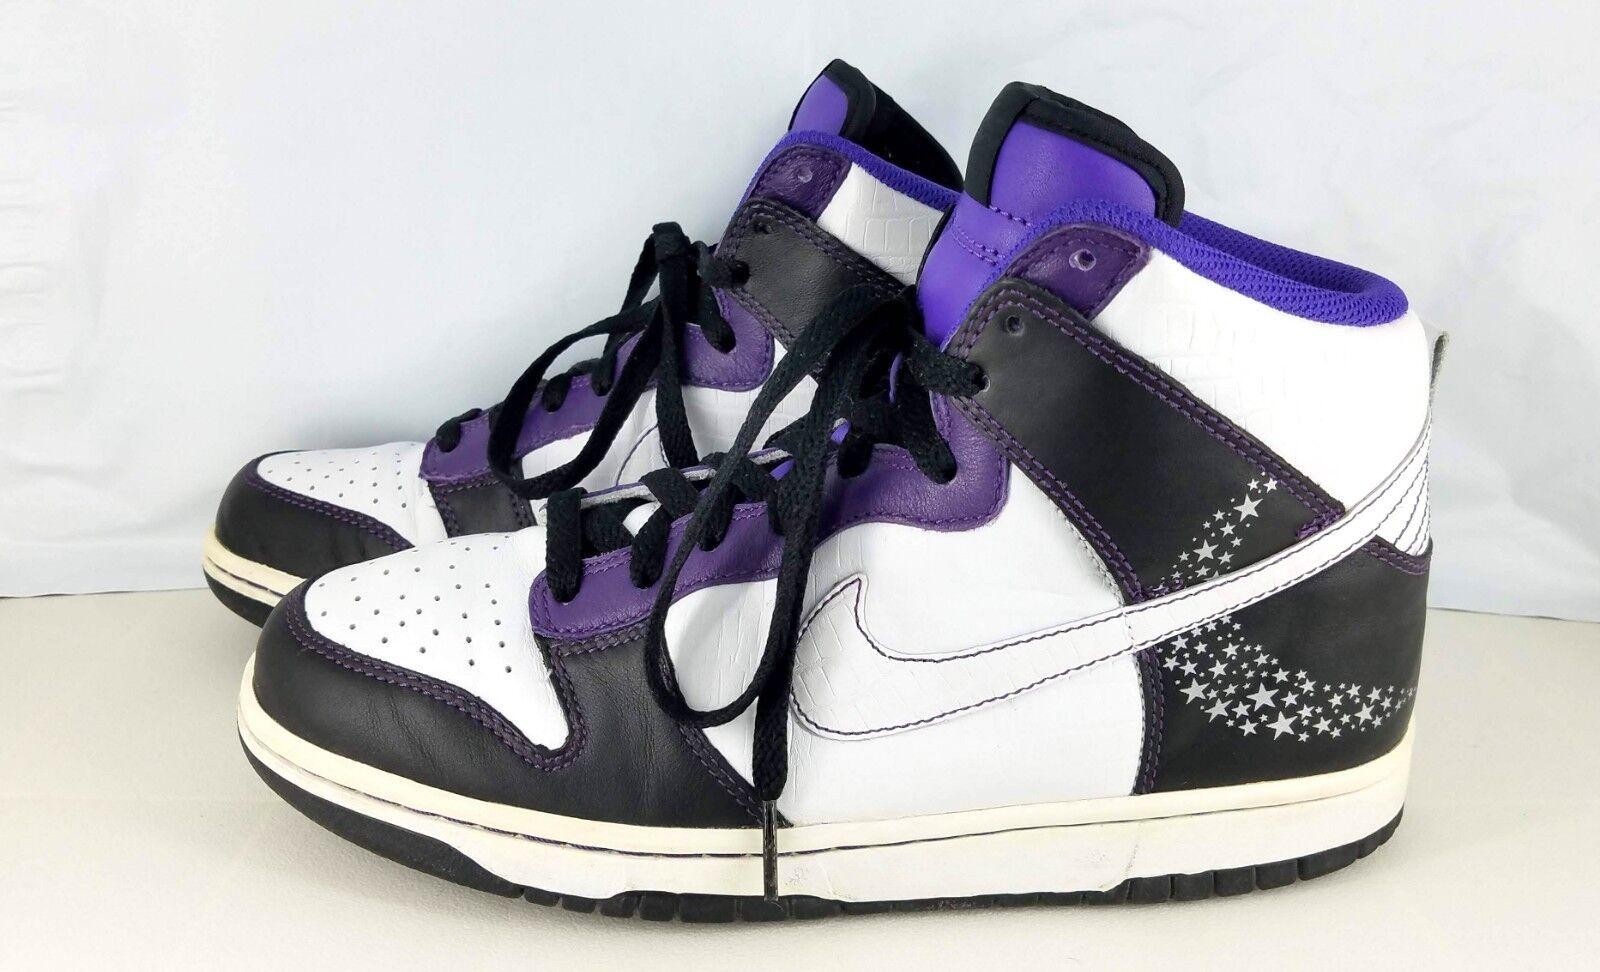 Nike Dunk Dunk Dunk High Premium Purple Quasar Moon + Stars Men's Size 8312786 011 2006 3362e8